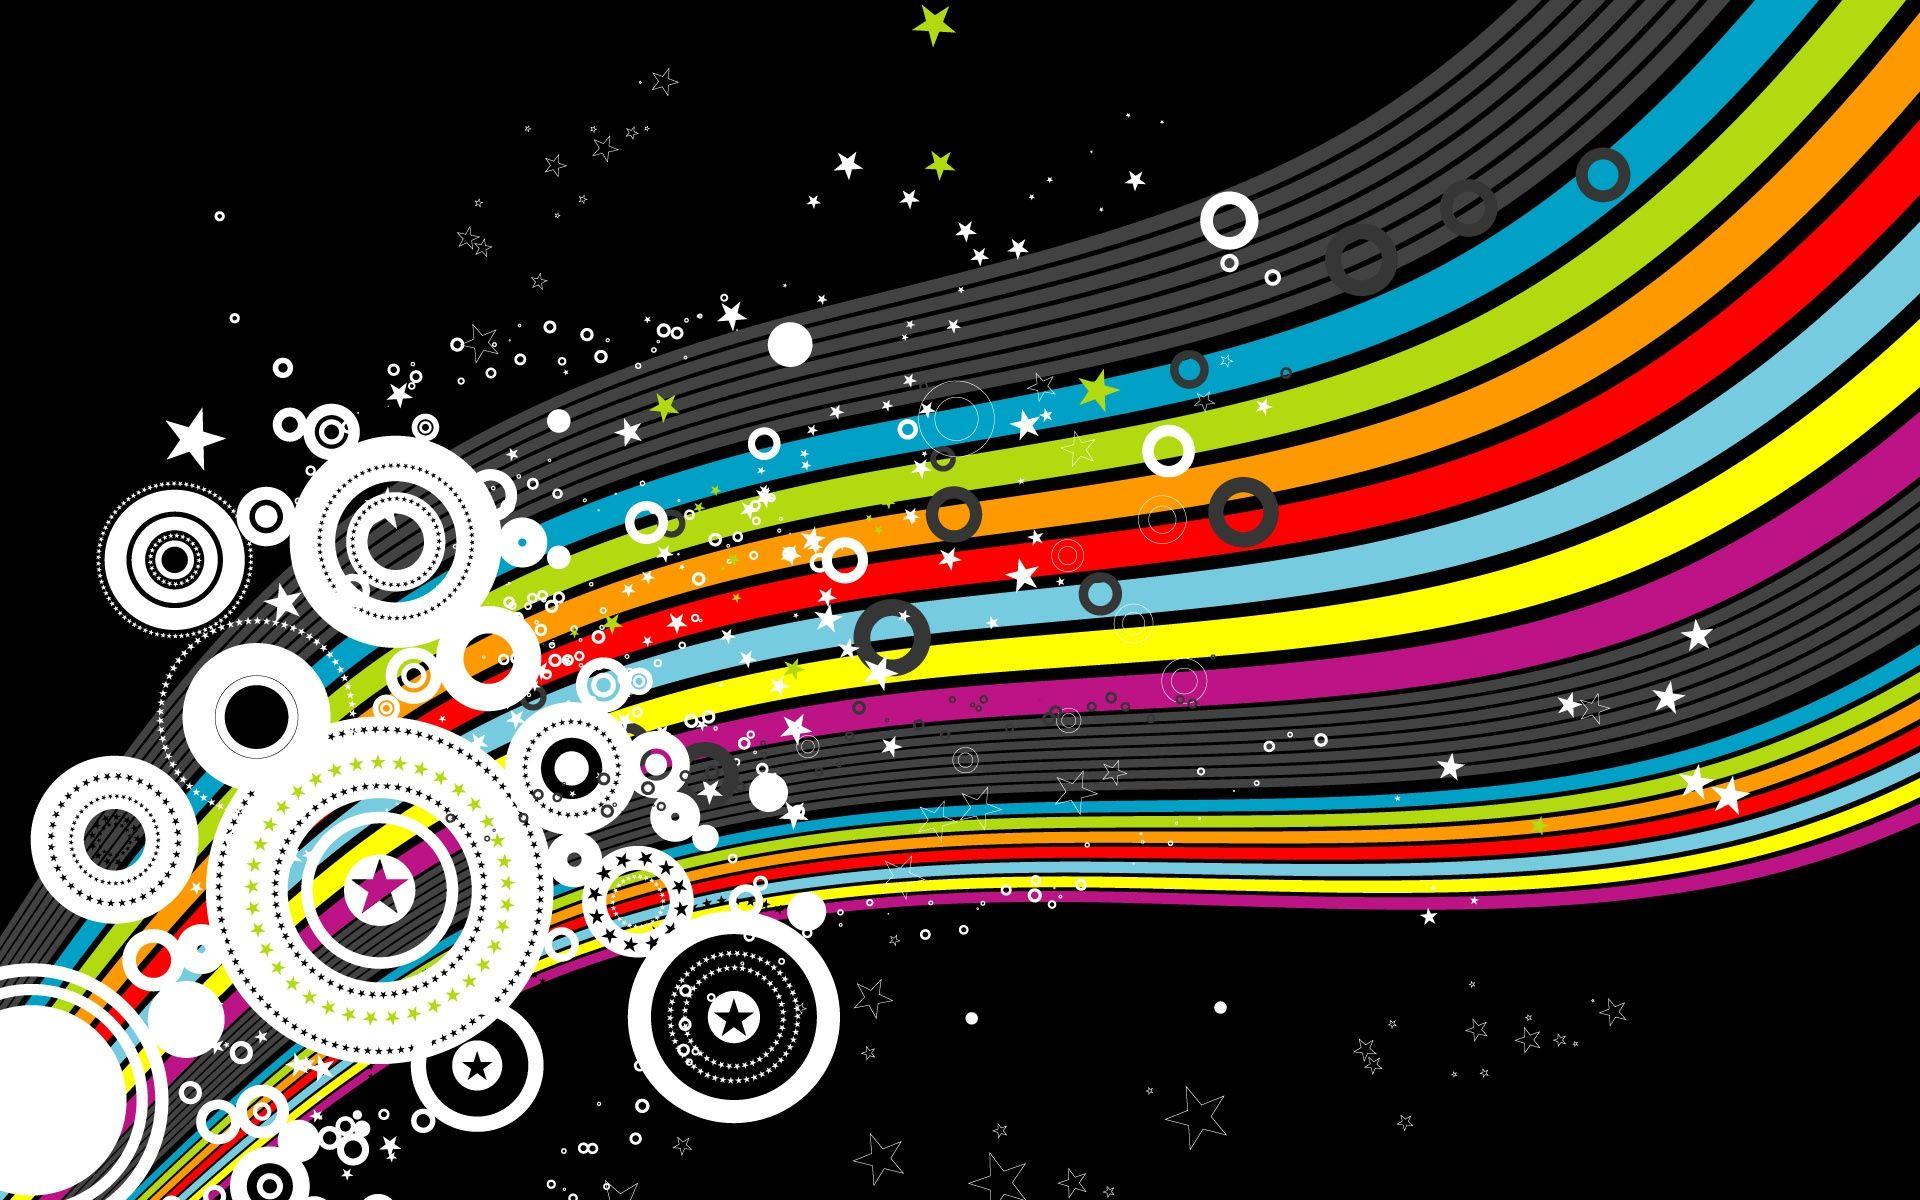 Cool Designs Cool Design Desktop Wallpaper 6798 With Images Rainbow Wallpaper Desktop Wallpaper Design Graphic Wallpaper